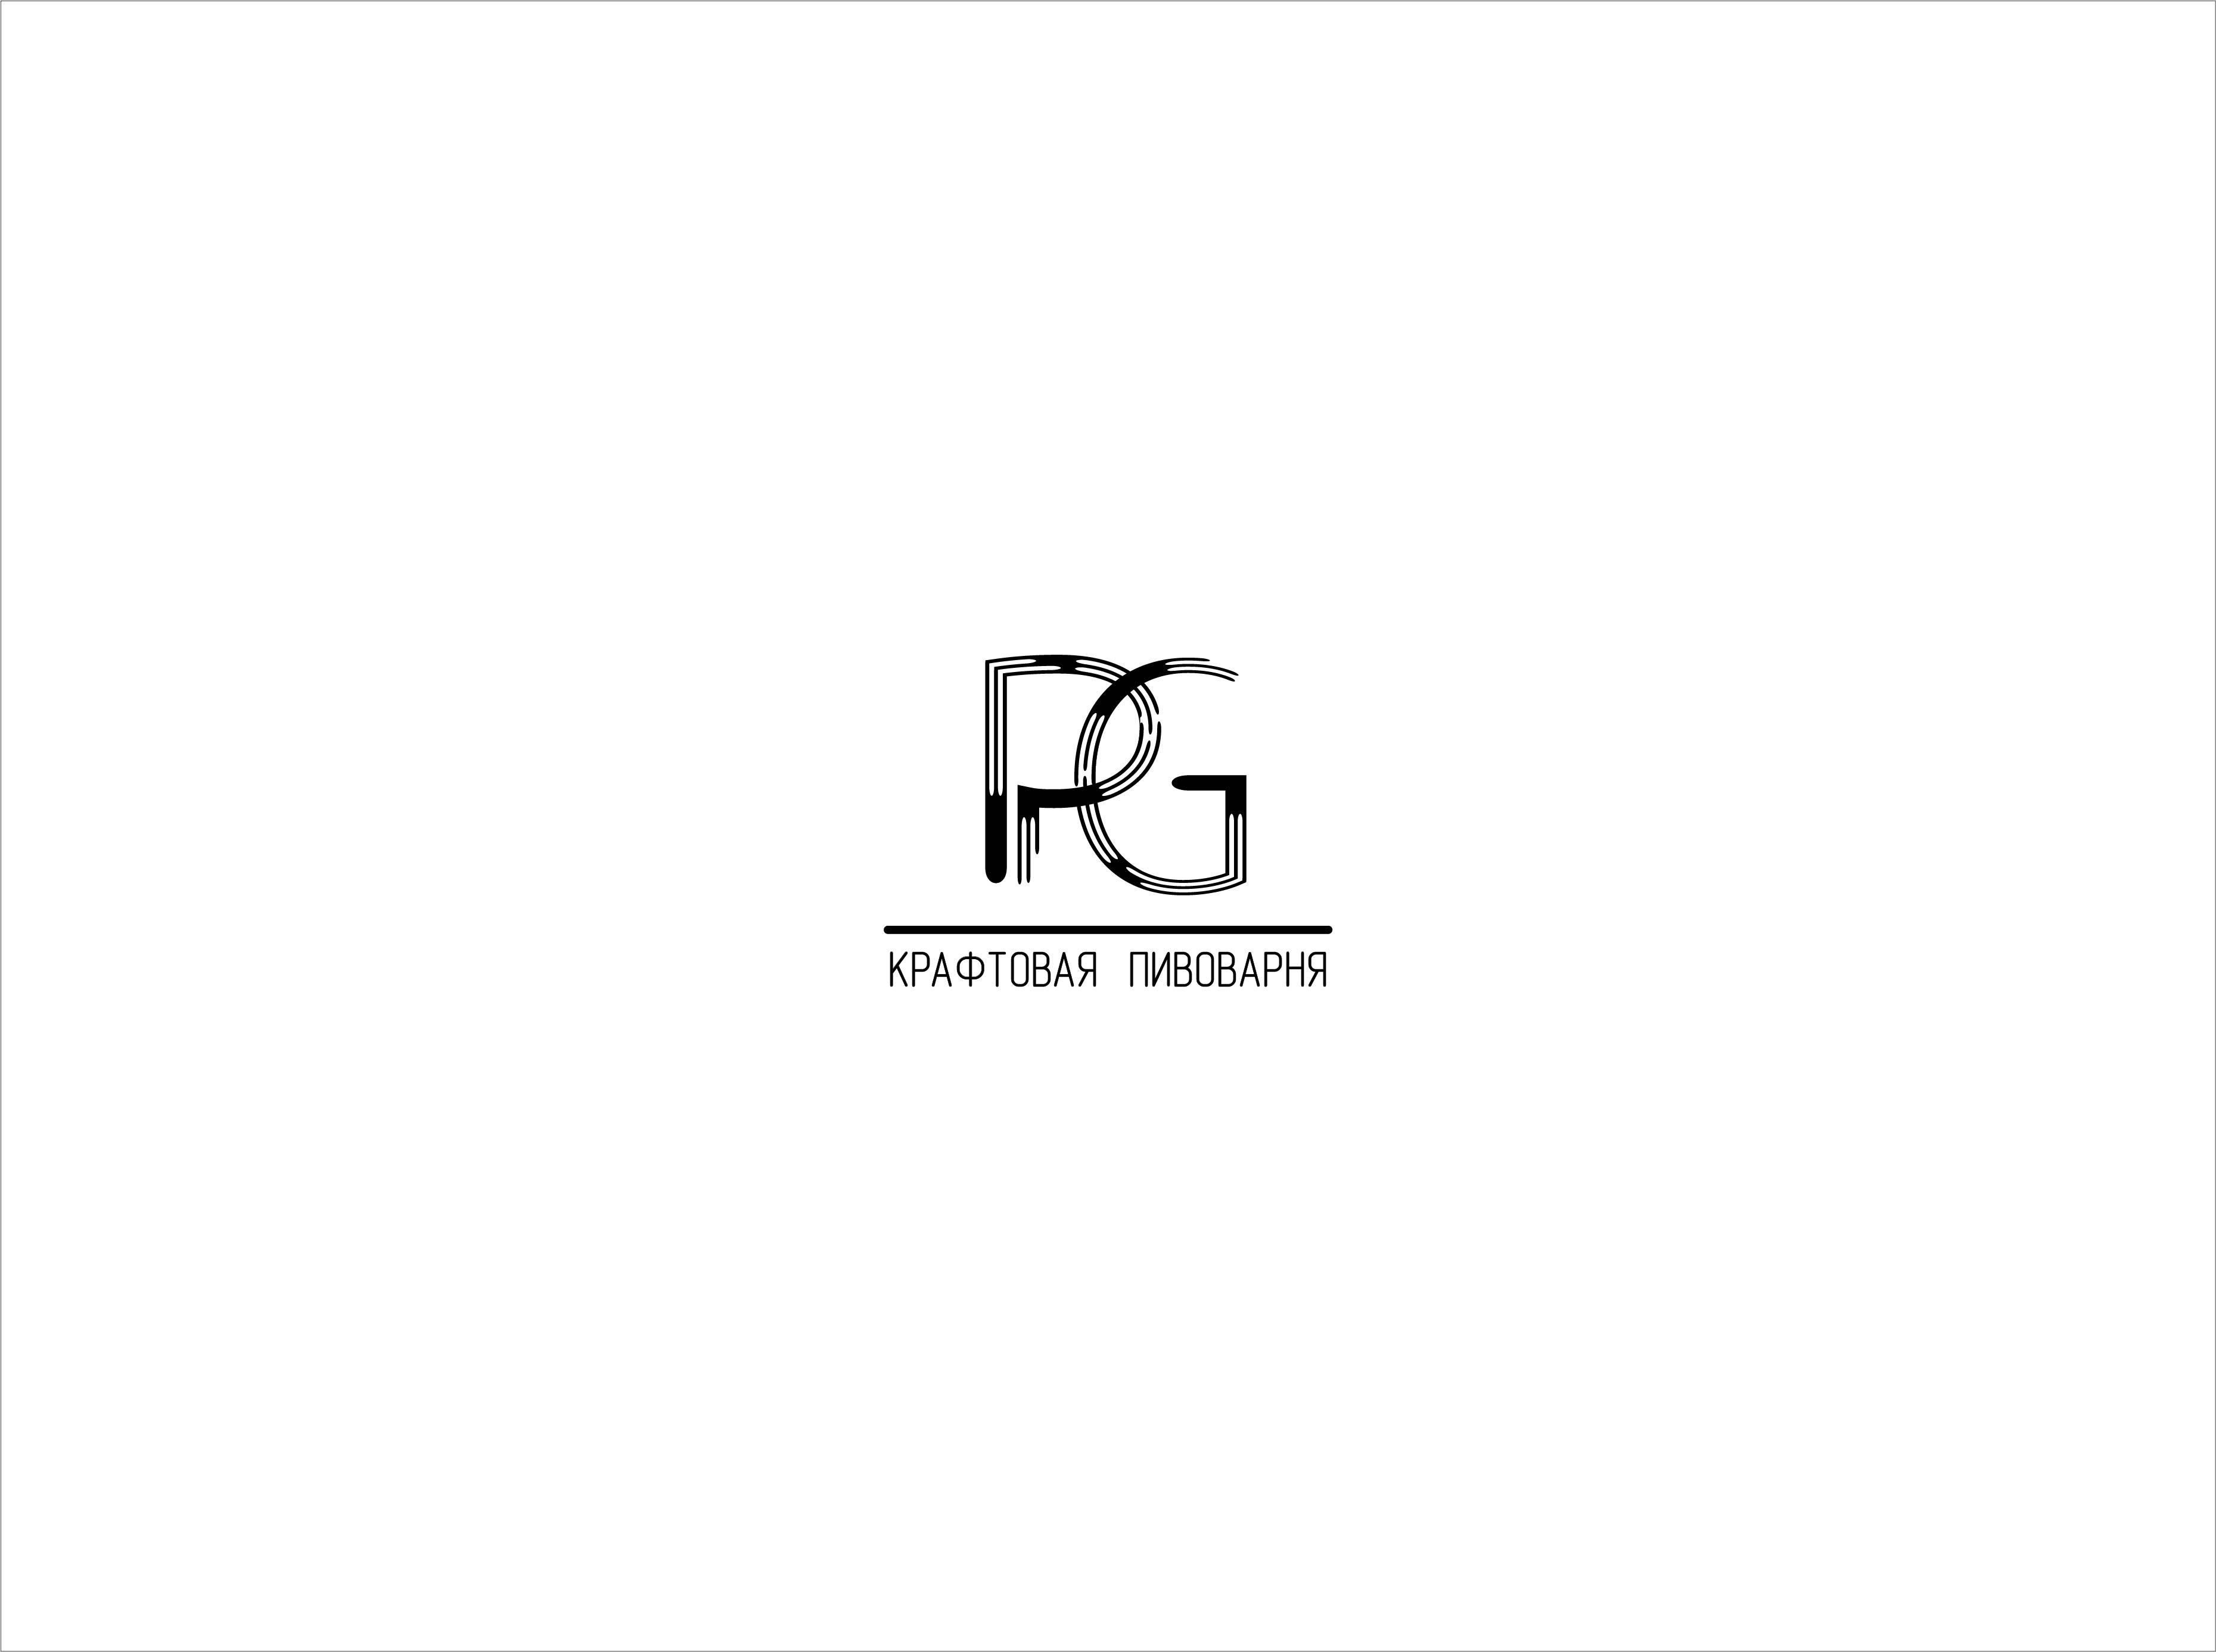 Логотип для Крафтовой Пивоварни фото f_9685cac78d62c6c2.jpg